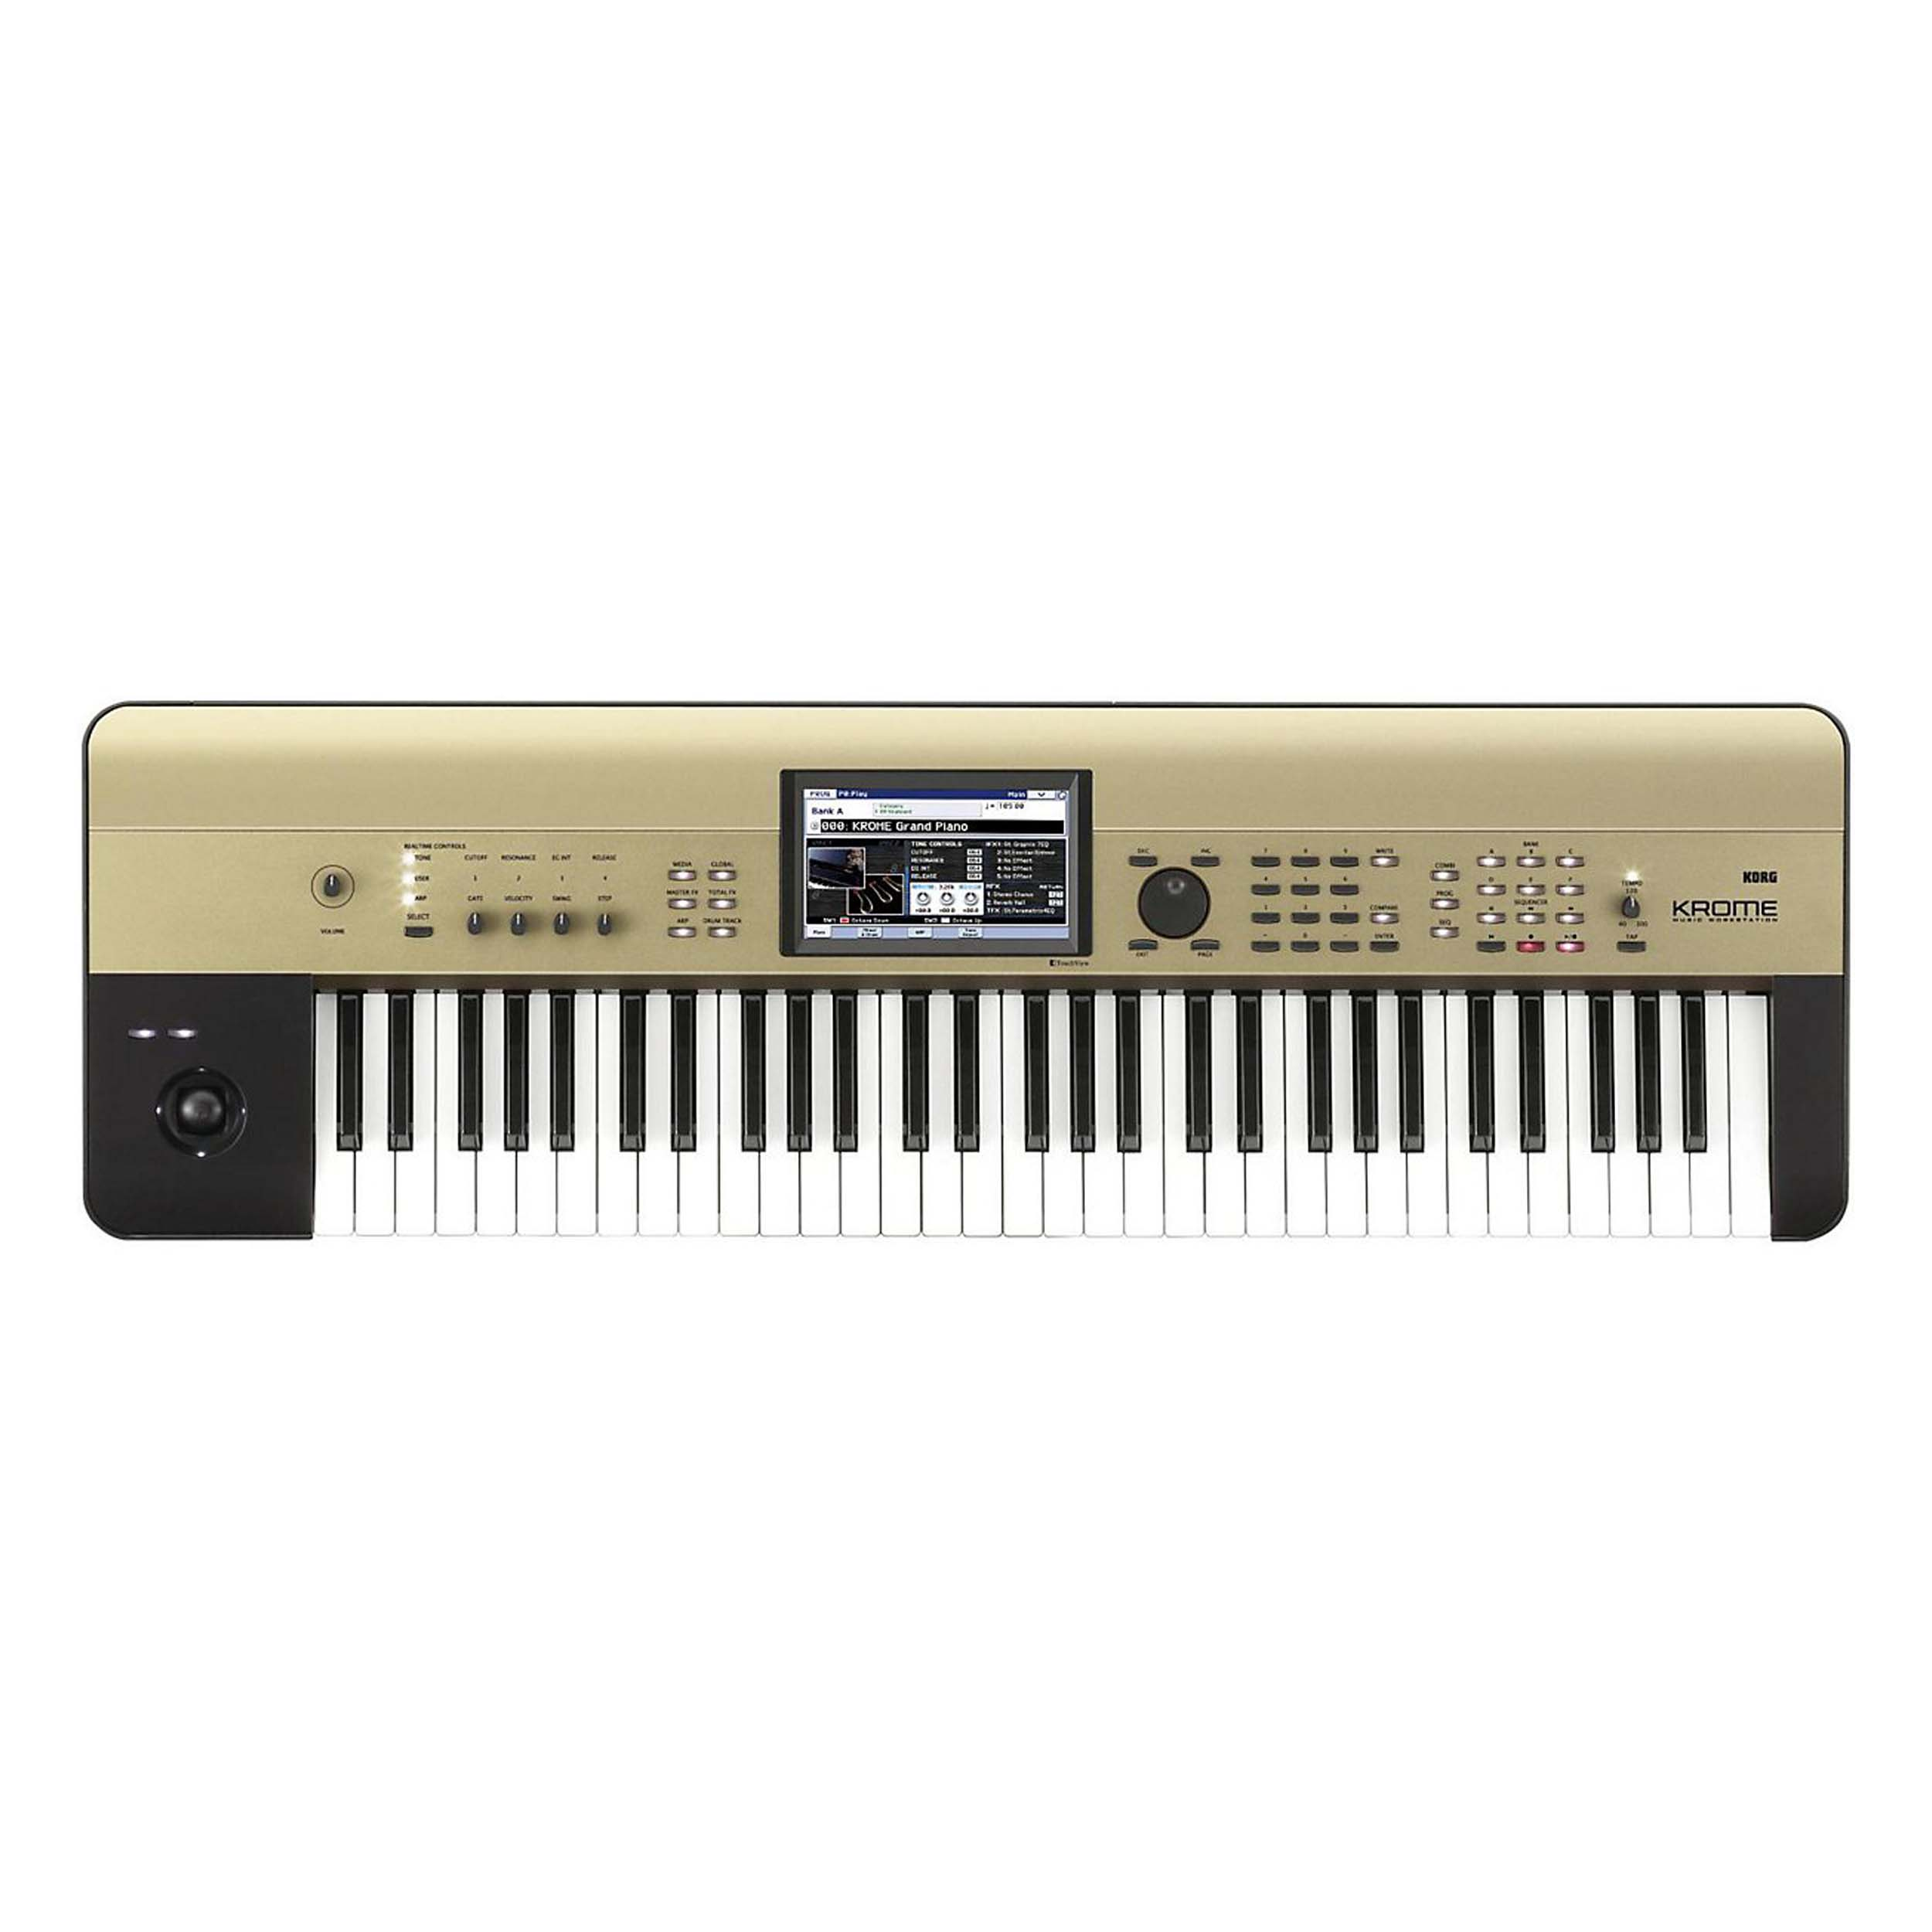 Details about Korg Krome 61 Keyboard Limited Edition Gold 61-Note  Workstation